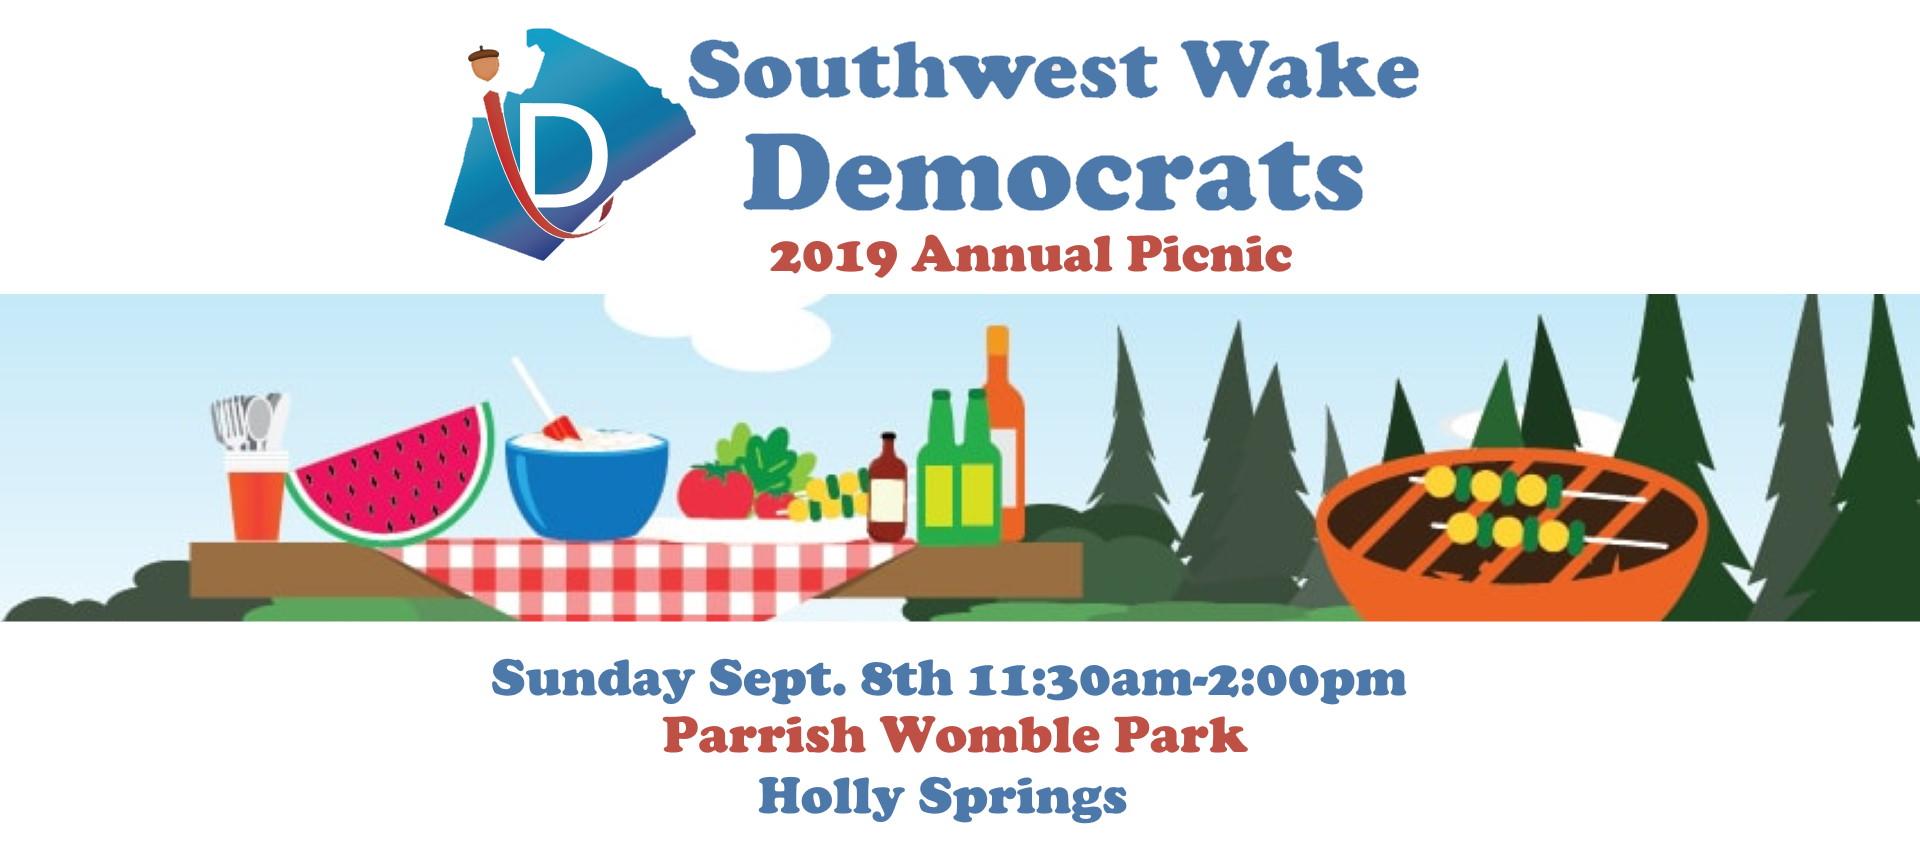 swwd_picnic_2019.jpg